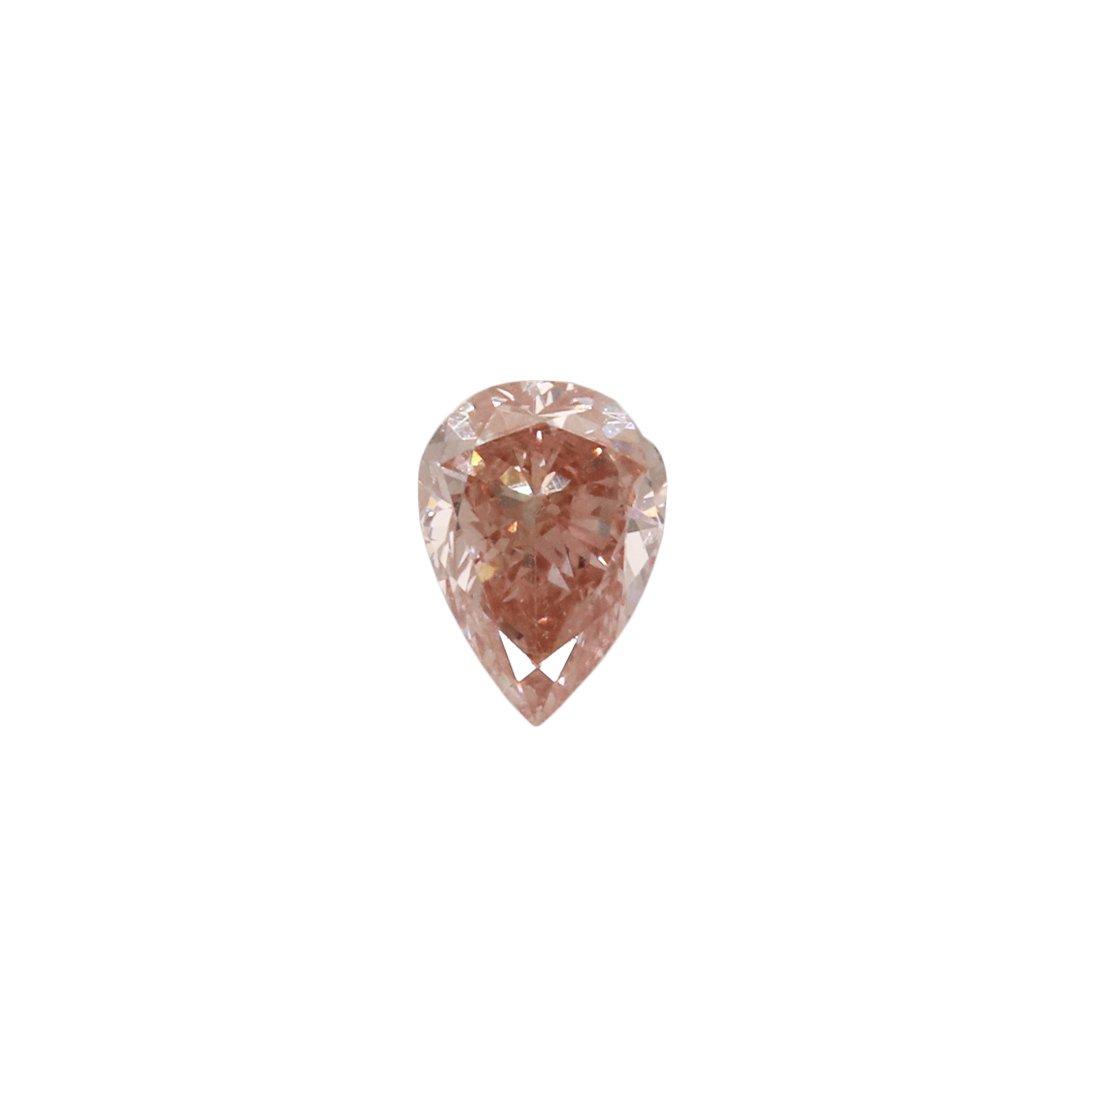 0.16ct Natural Fancy Pink, 5PR, SI2, Argyle Pink Diamond